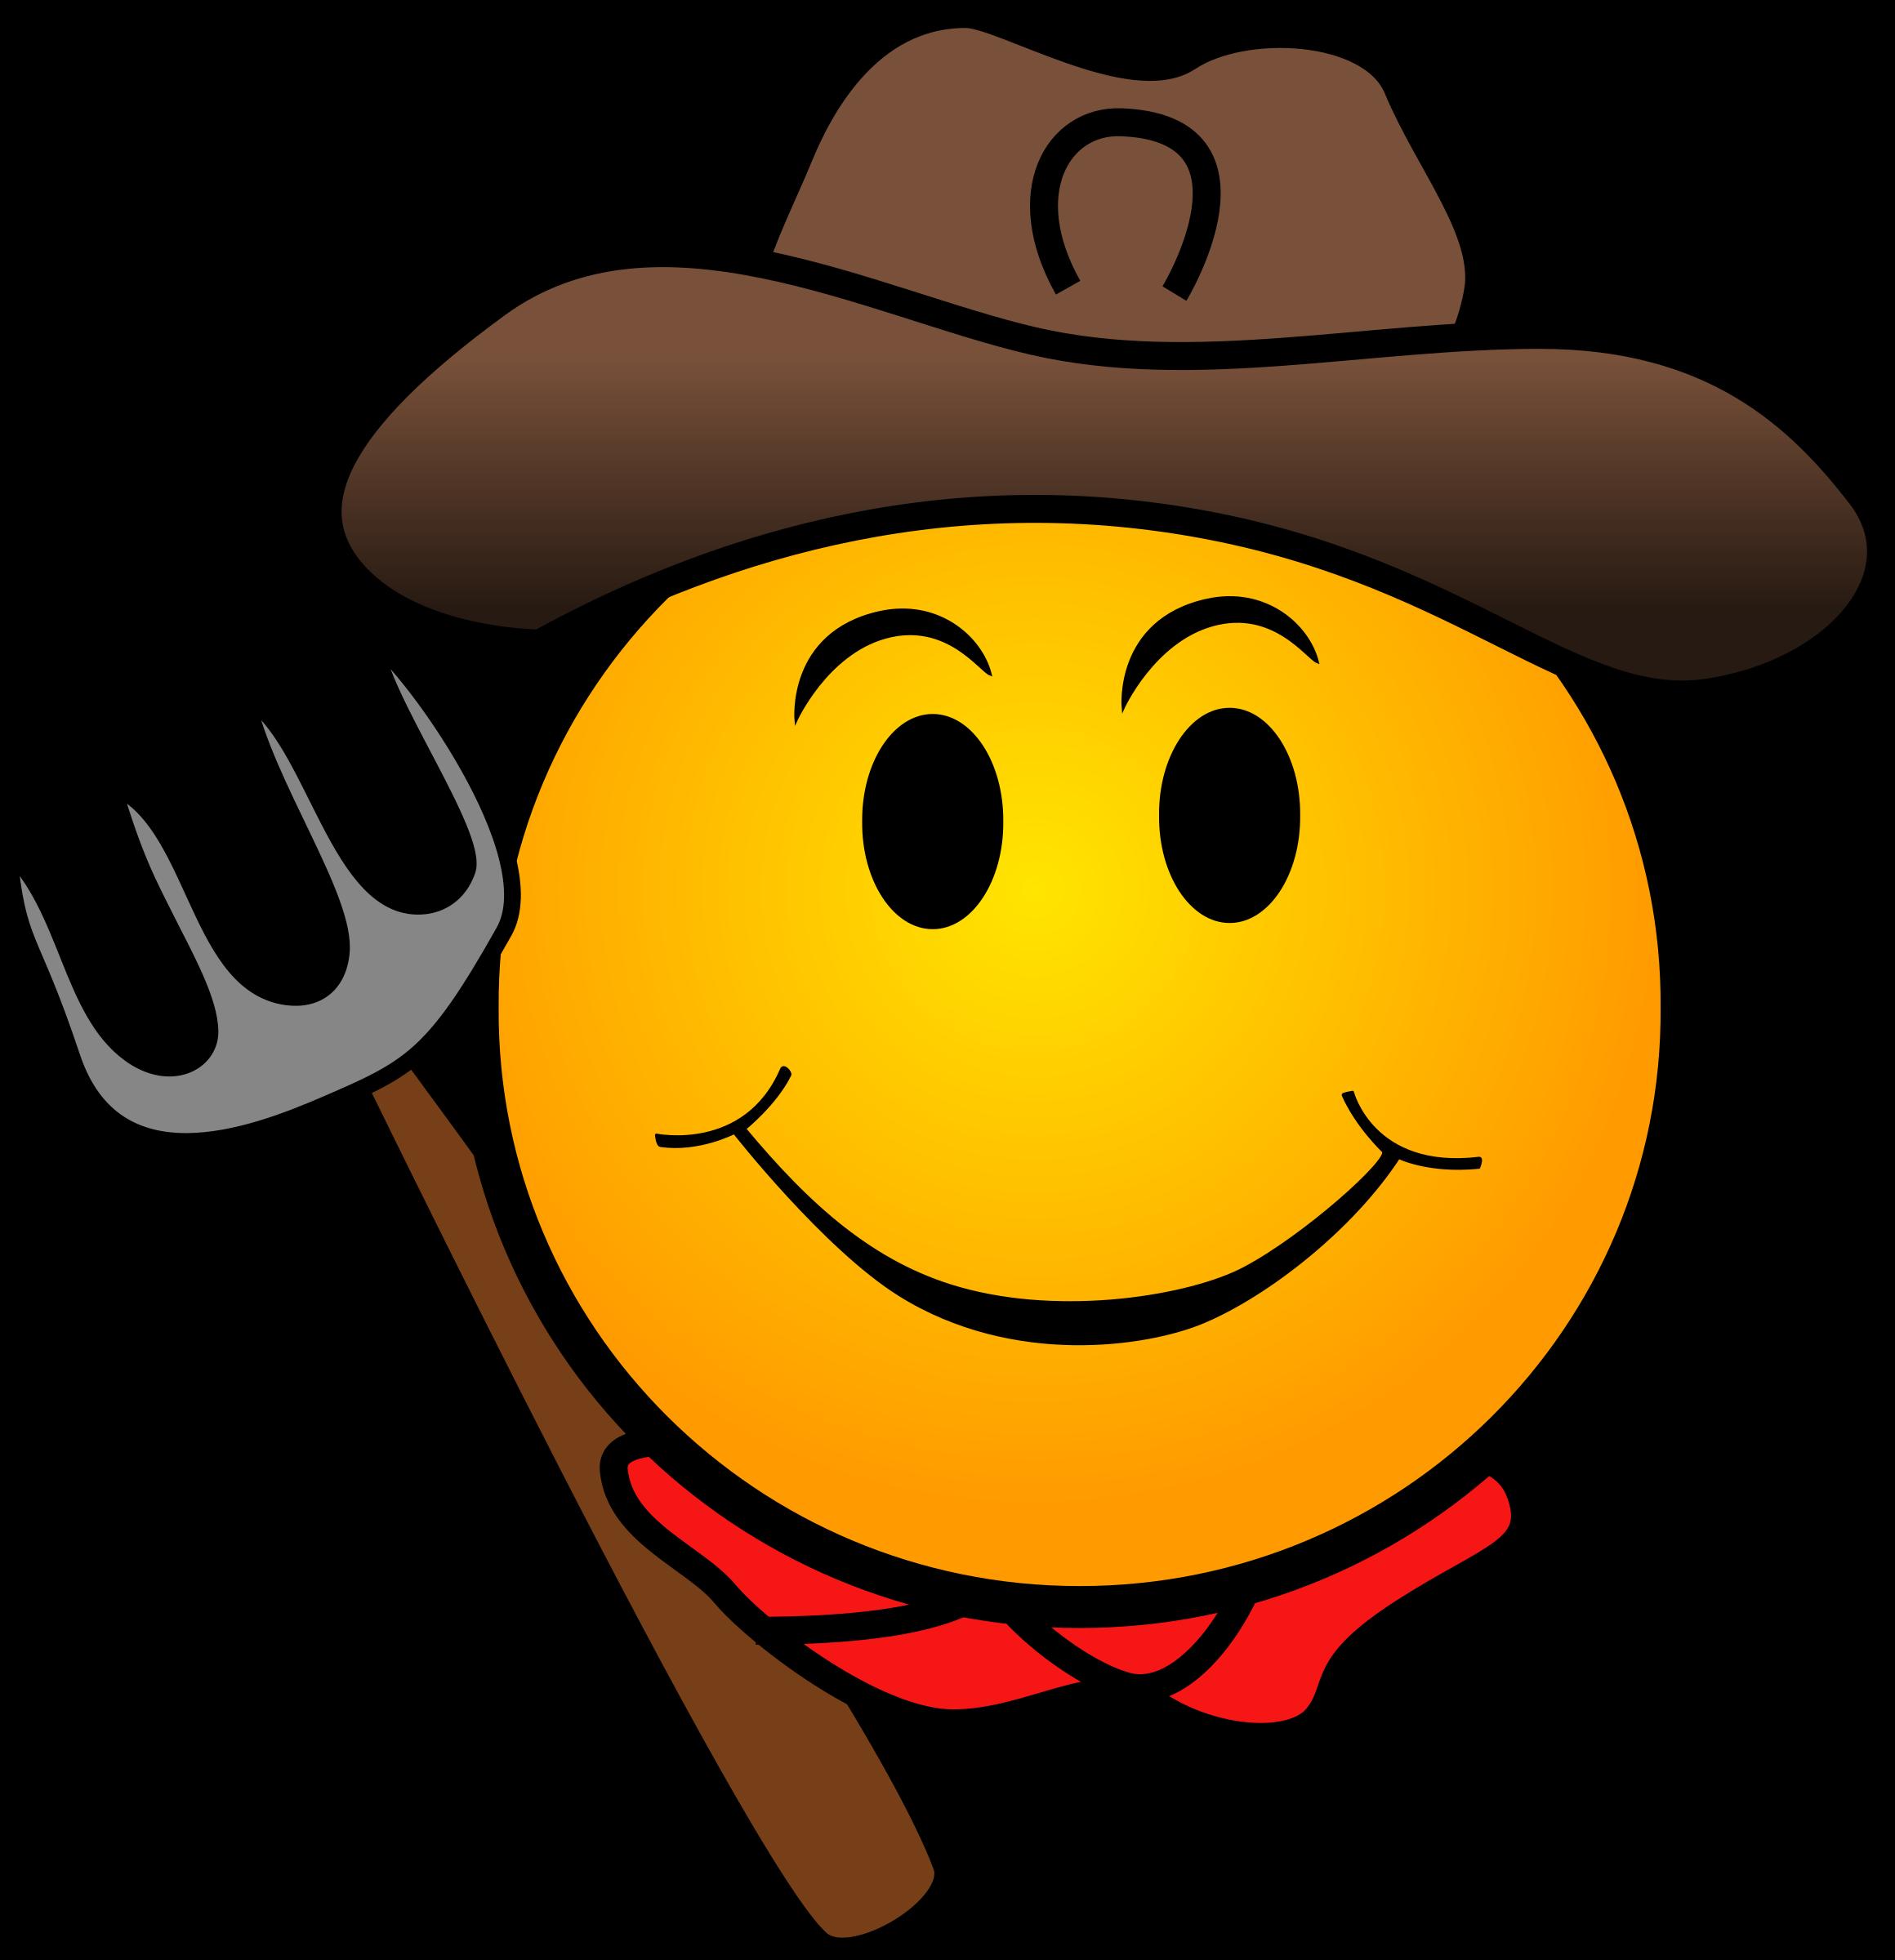 Farmer smiley big image. Whip clipart emoji